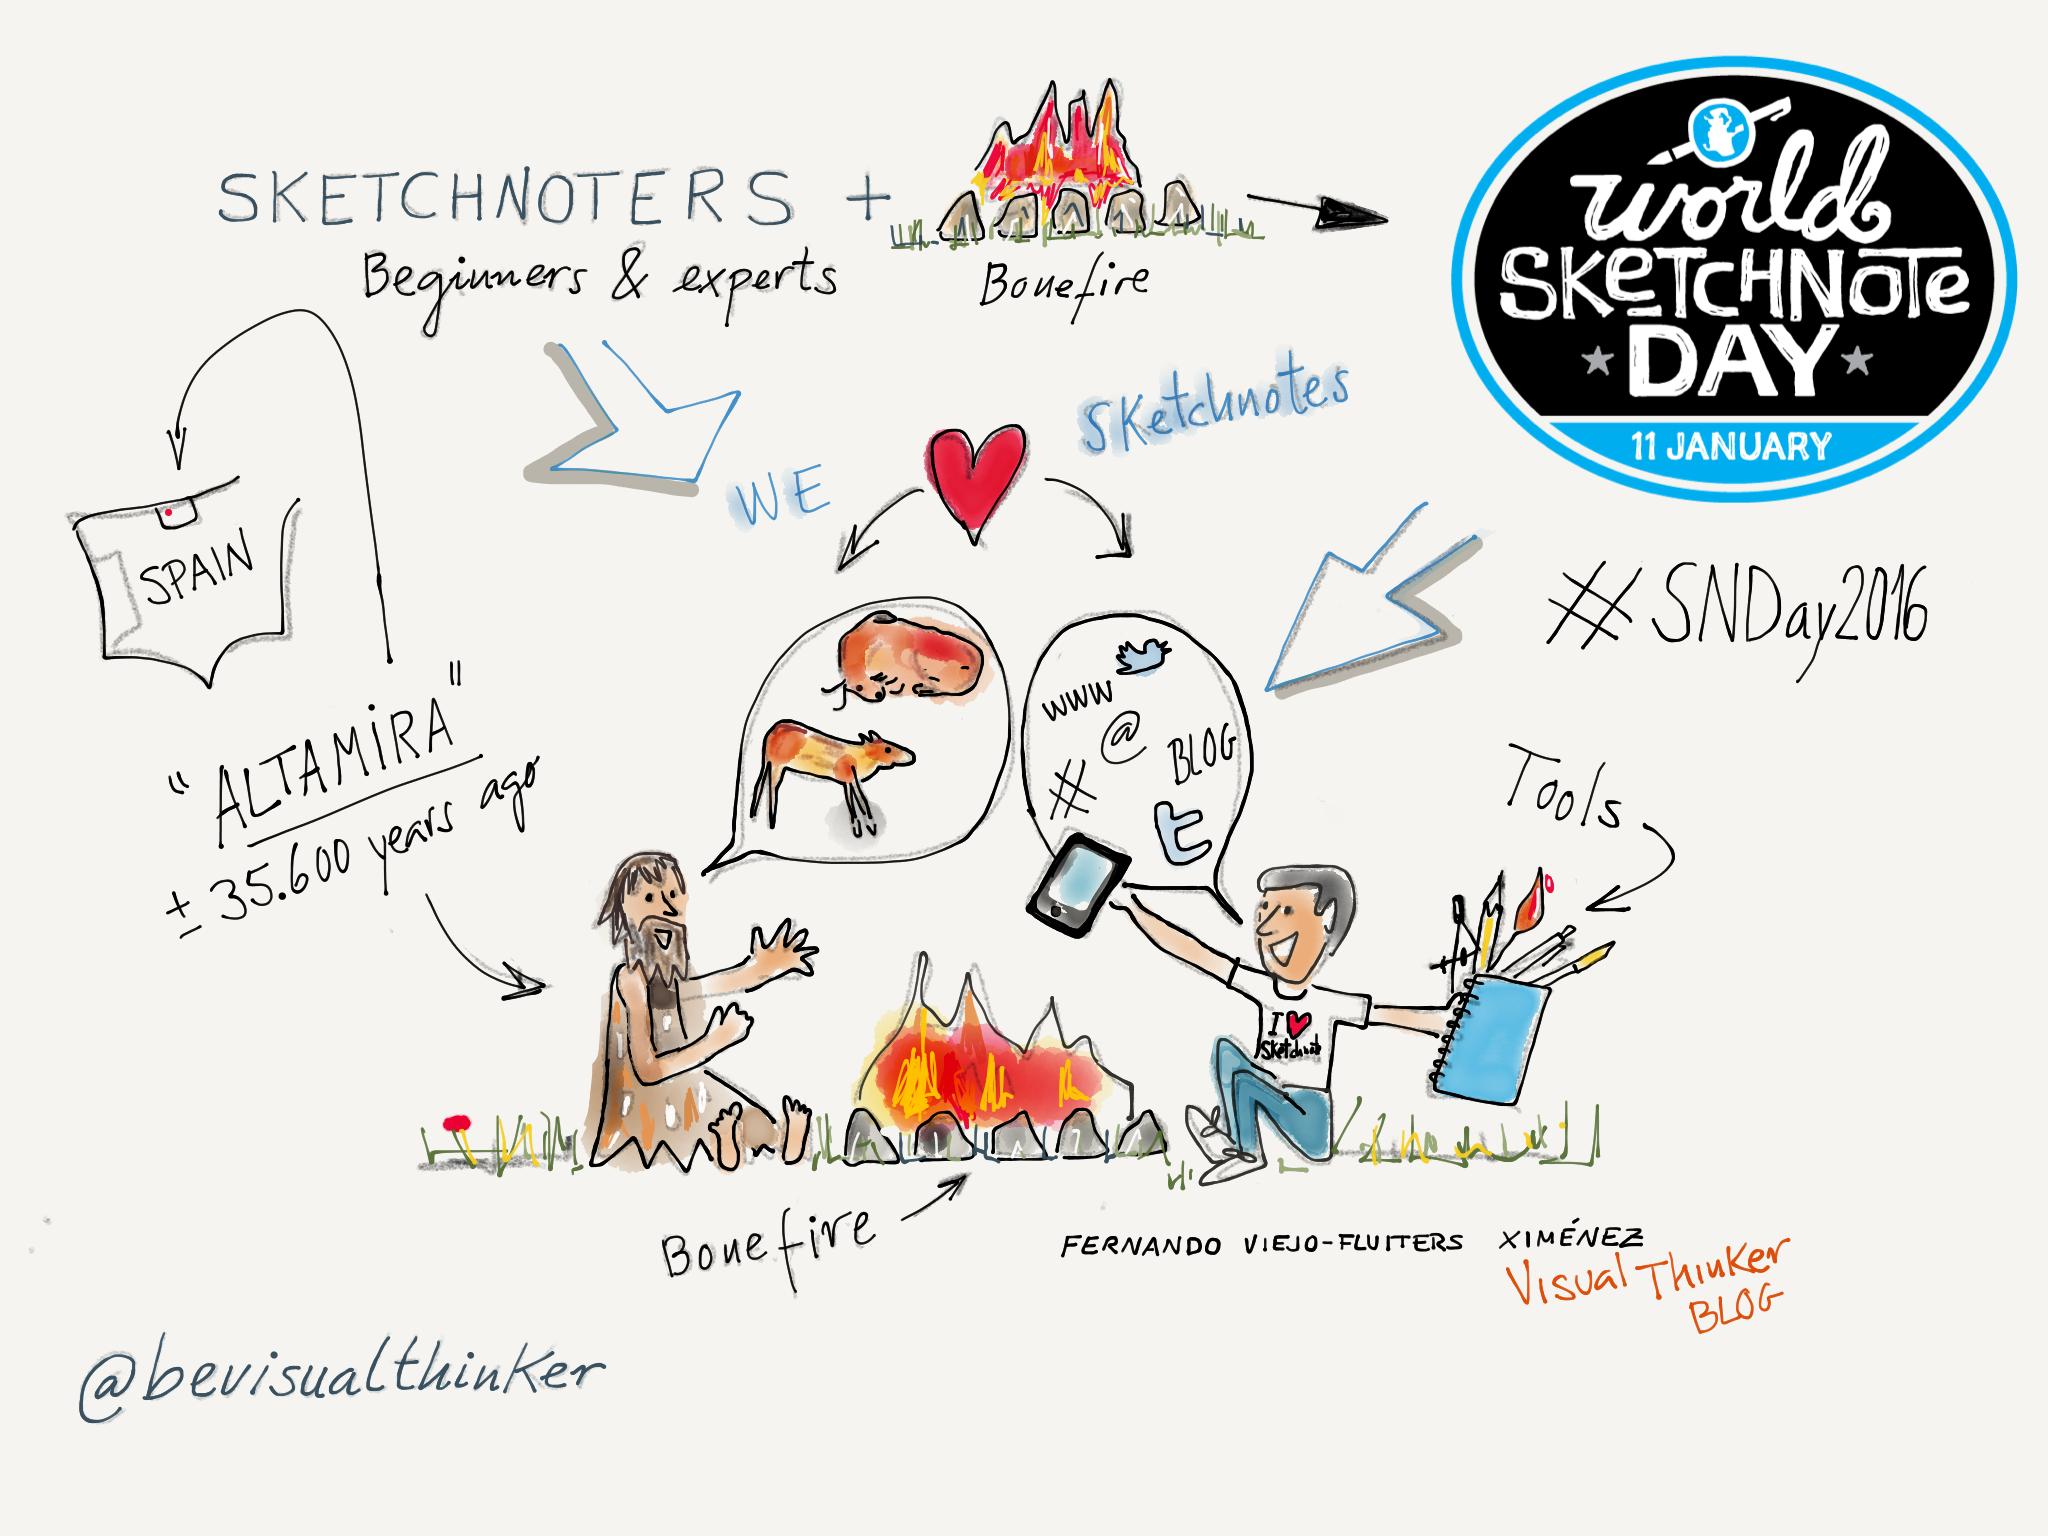 .@SketchnoteArmy Feliz Sketchnote day #SNDay2016 ! Disfrutando con .@FiftyThree https://t.co/xeuGHjlcdN